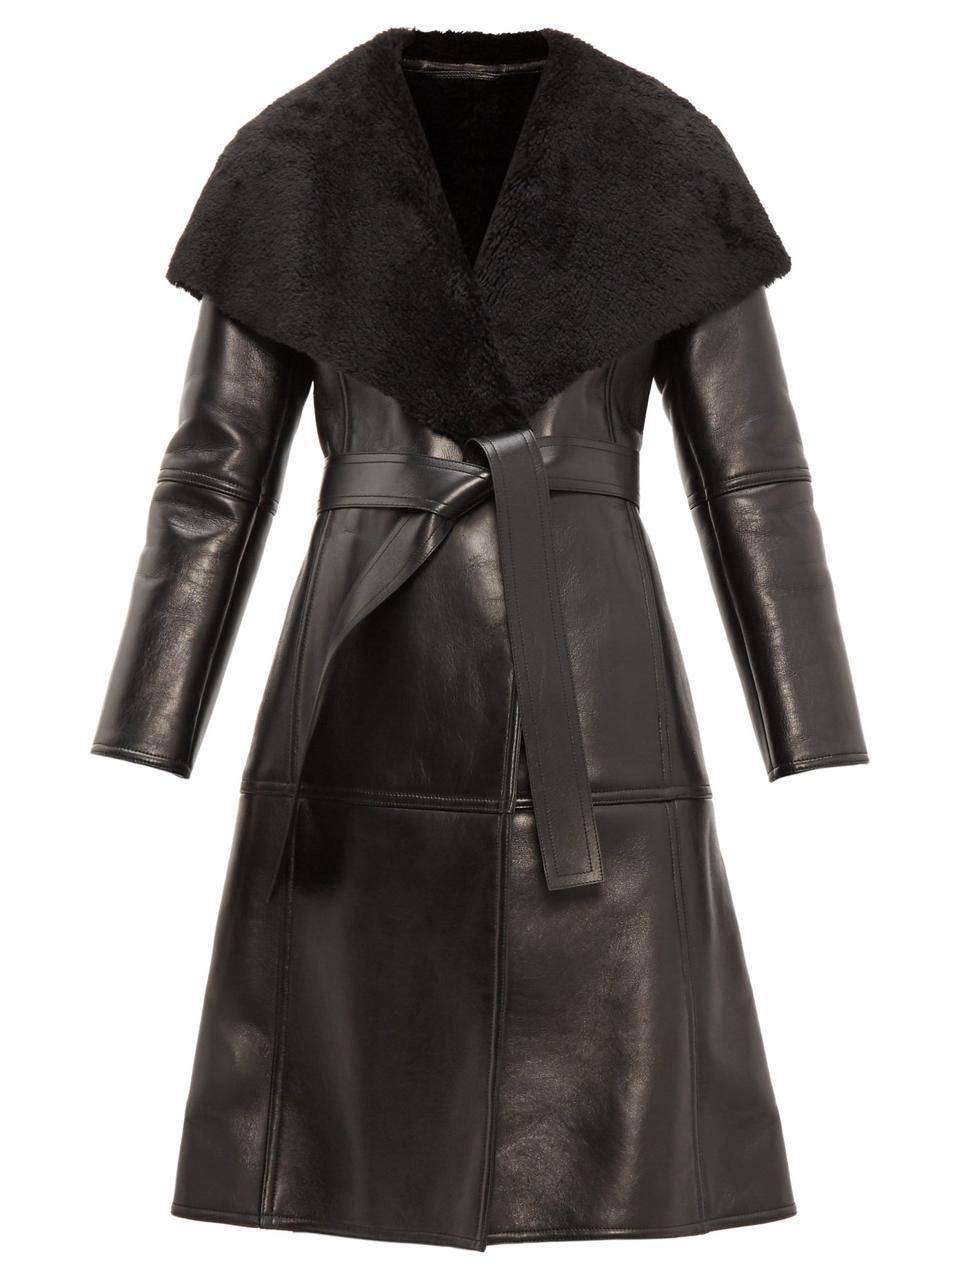 Balenciaga Shearling-Collar Single-Breasted Leather Coat